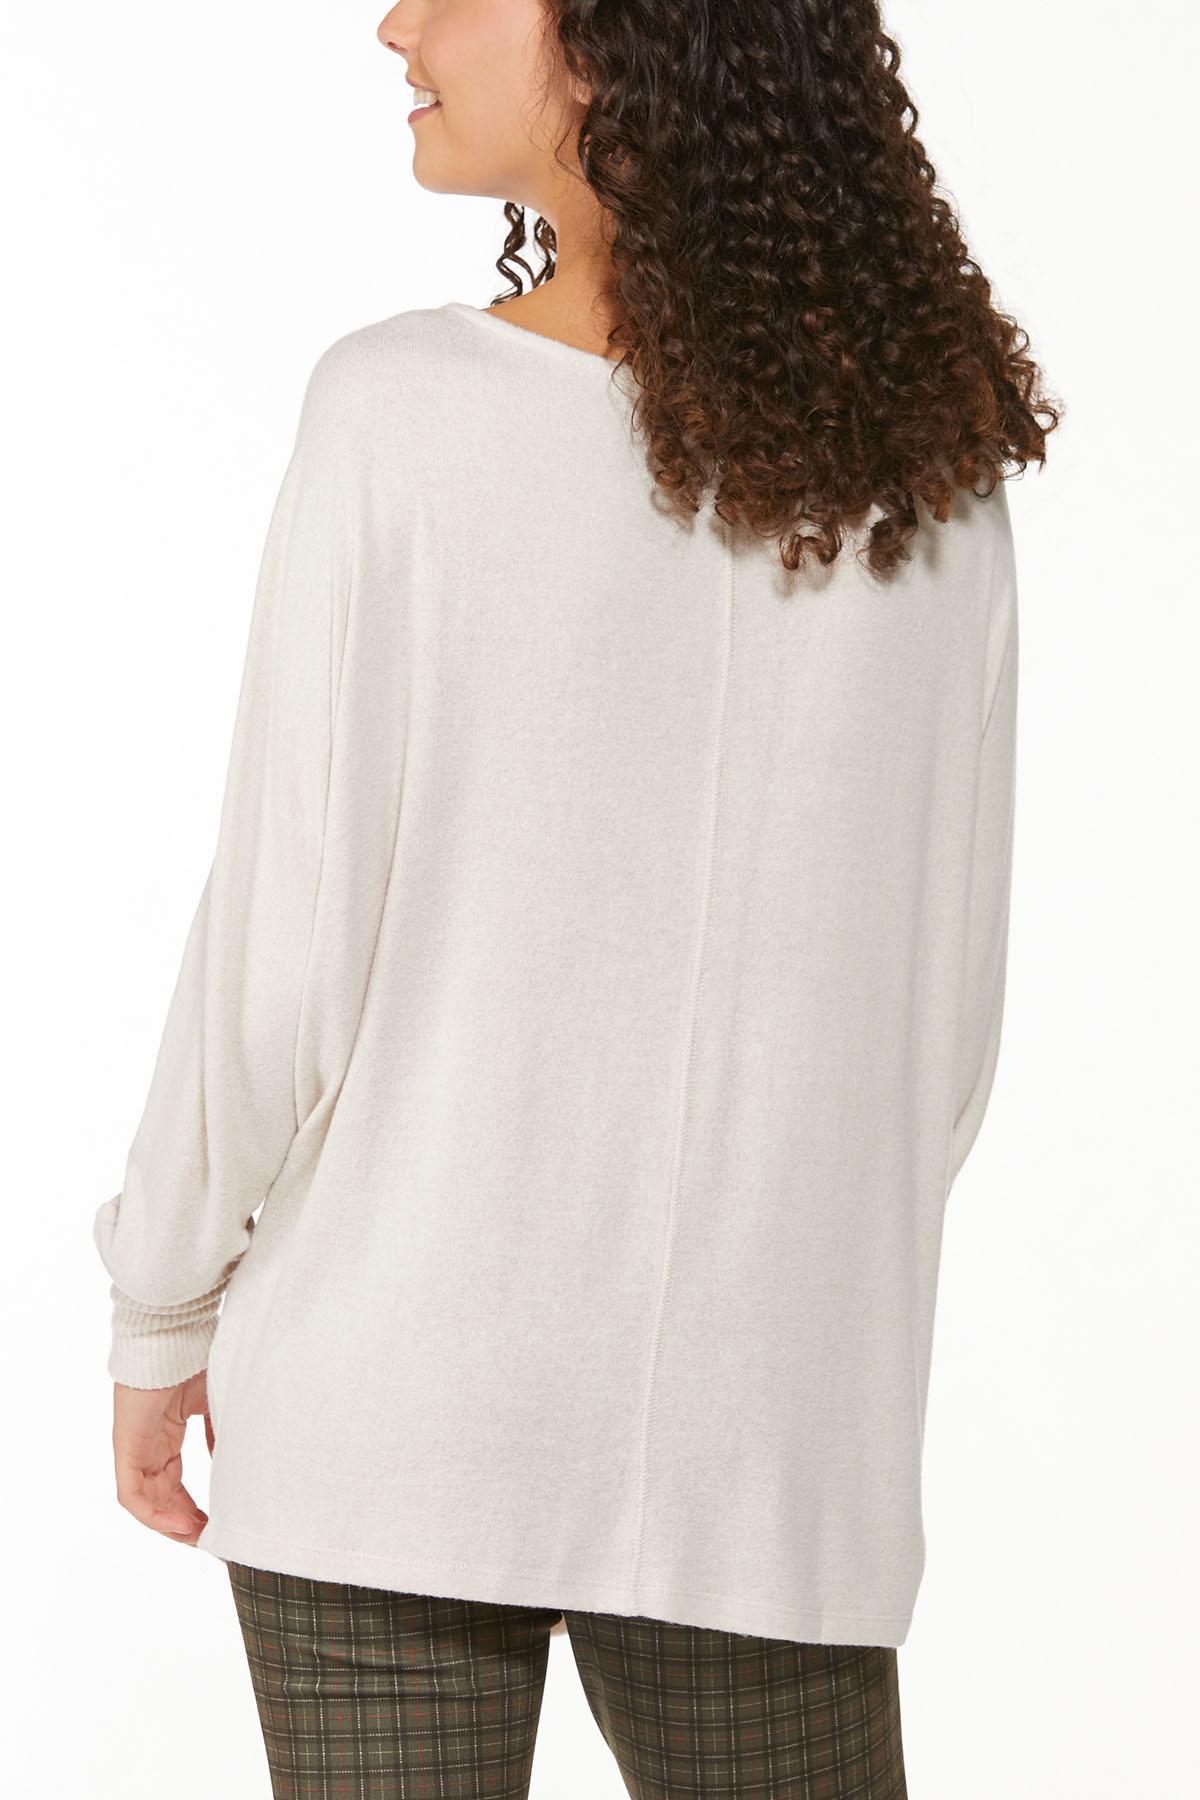 Warm Oatmeal Sweater (Item #44790362)